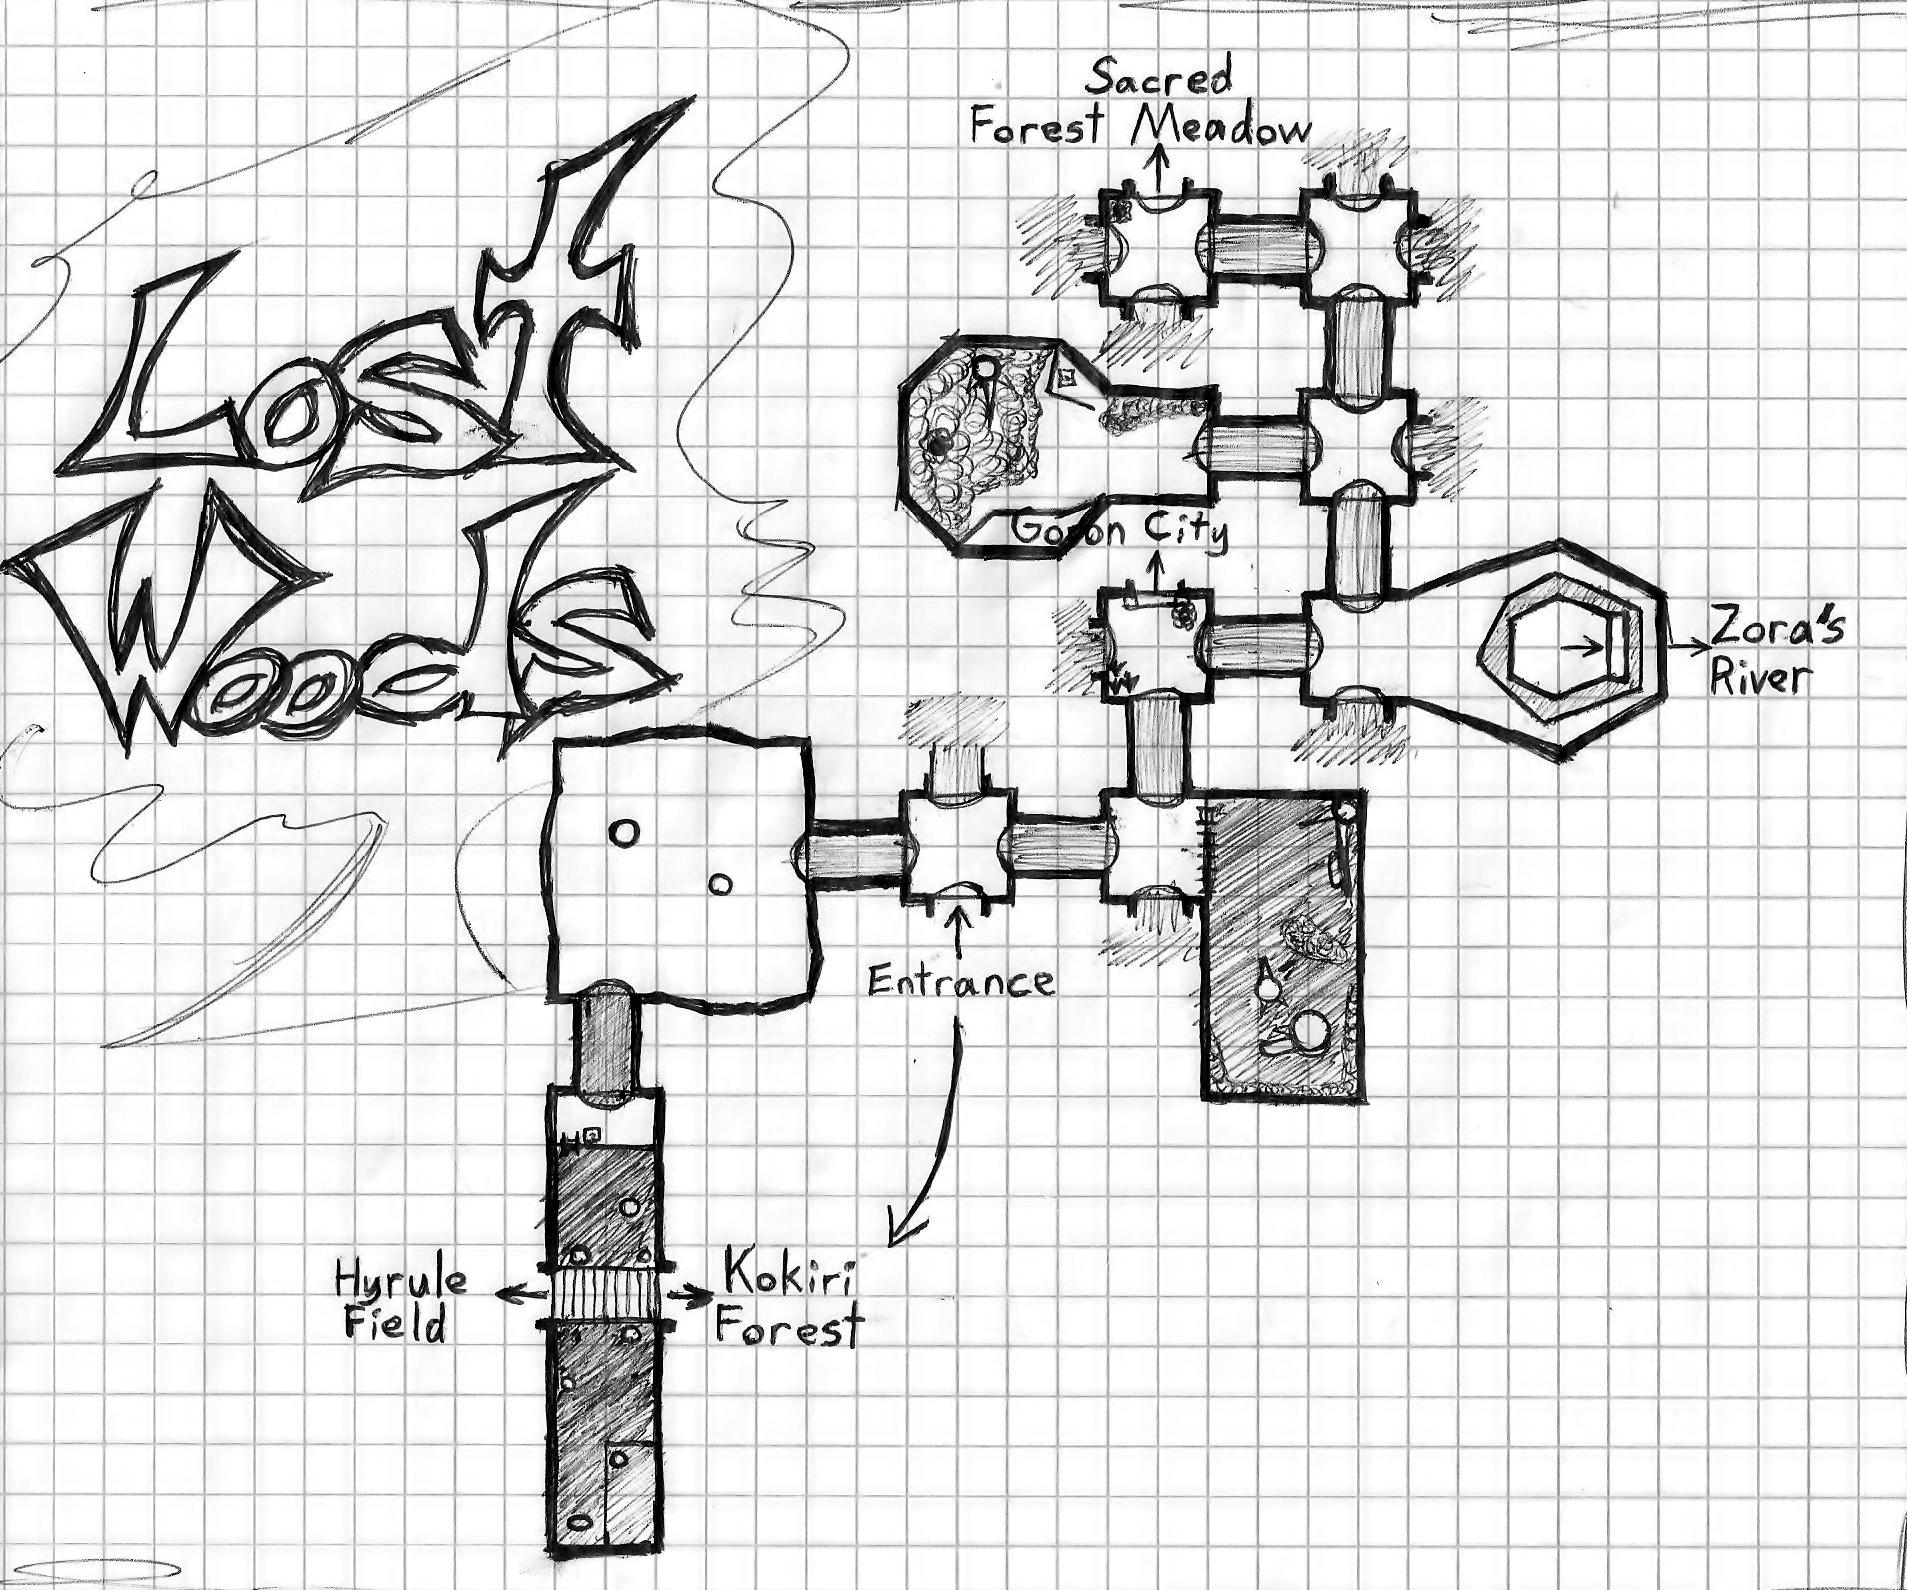 lost woods map by crimsonangelofshadow on deviantart